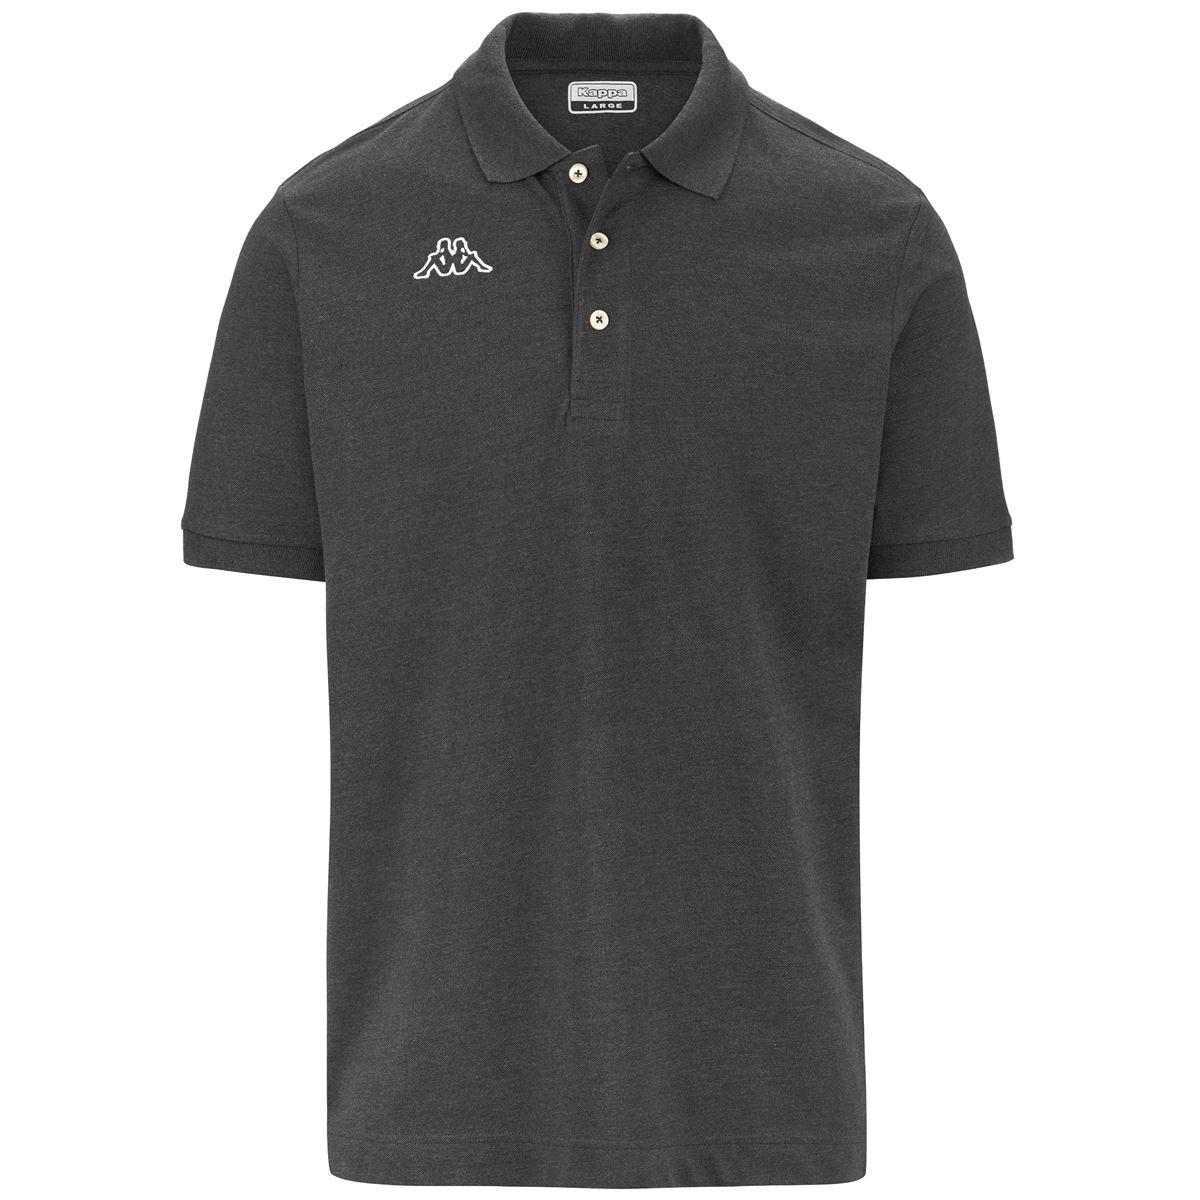 Kappa-Polo-Shirts-Uomo-LOGO-LIFE-MSS-Tennis-sport-Polo miniatura 28